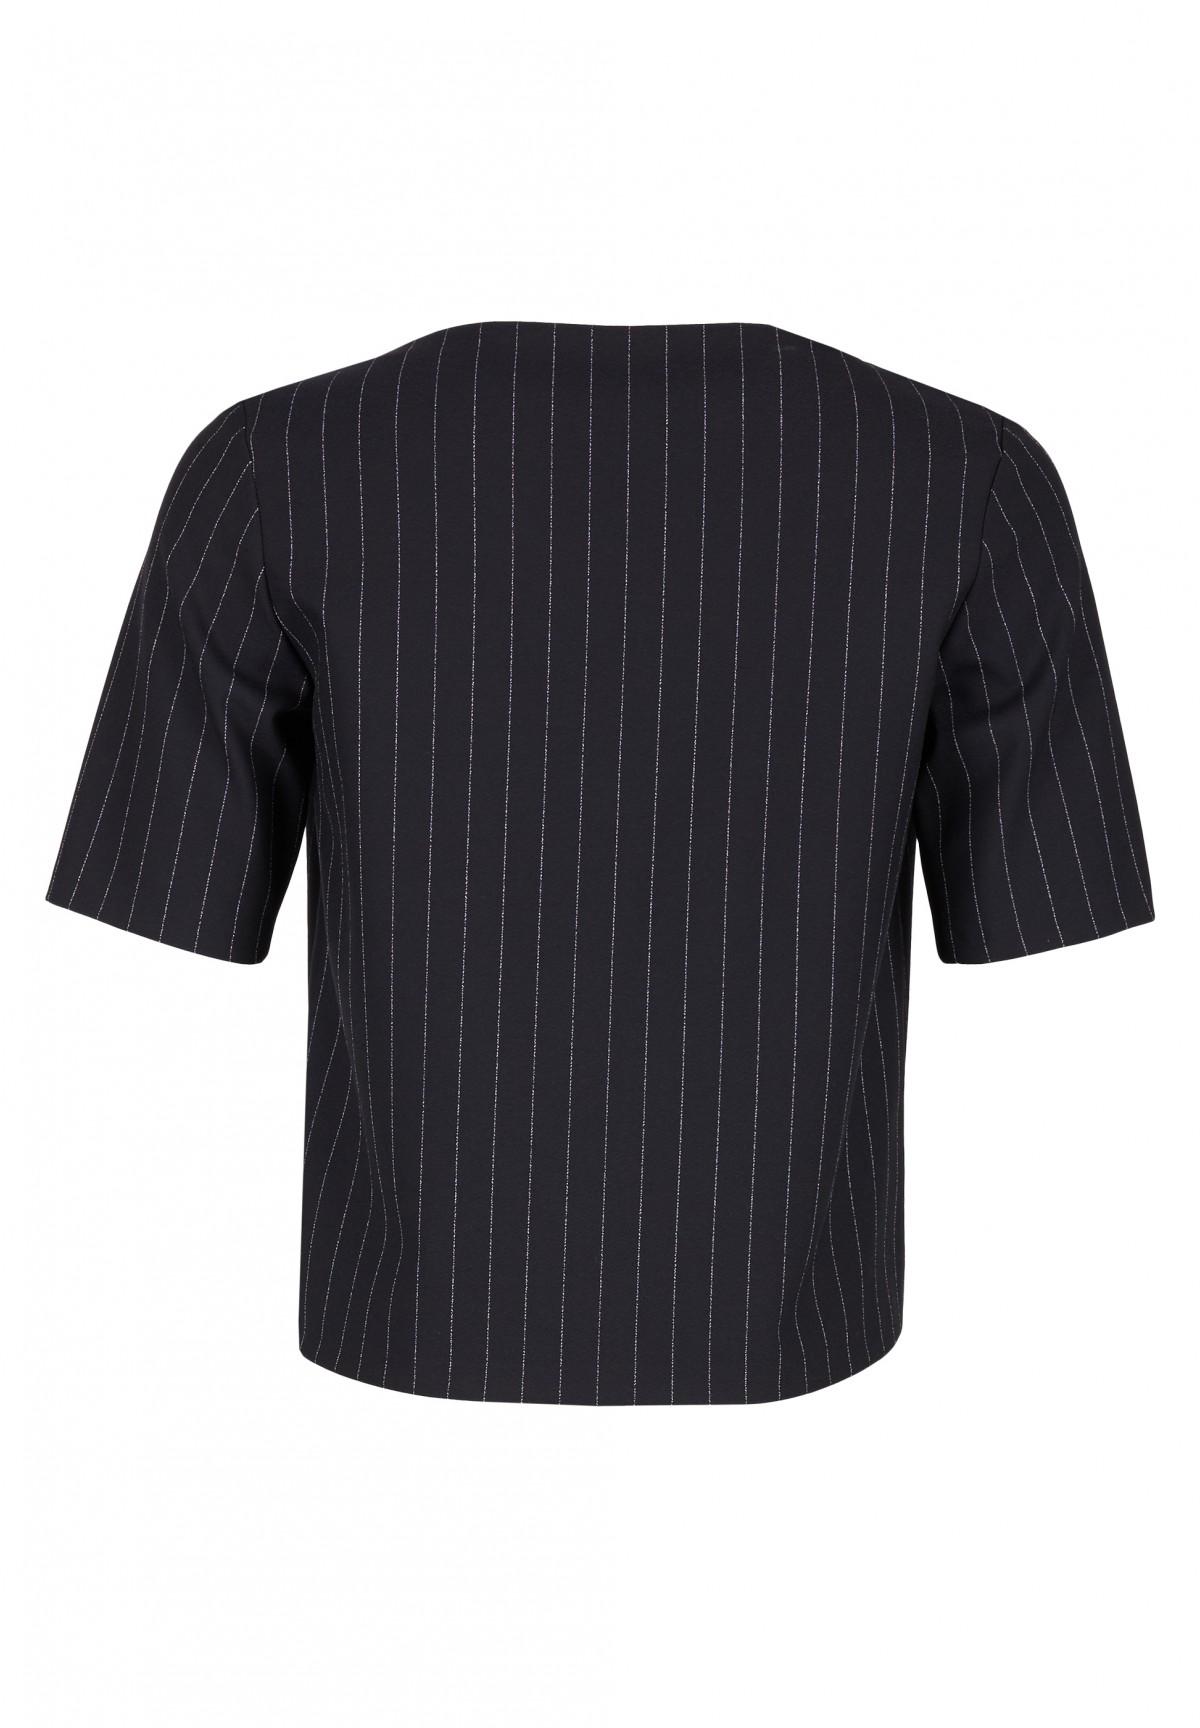 Trendiges Blusen-Shirt / Bluse